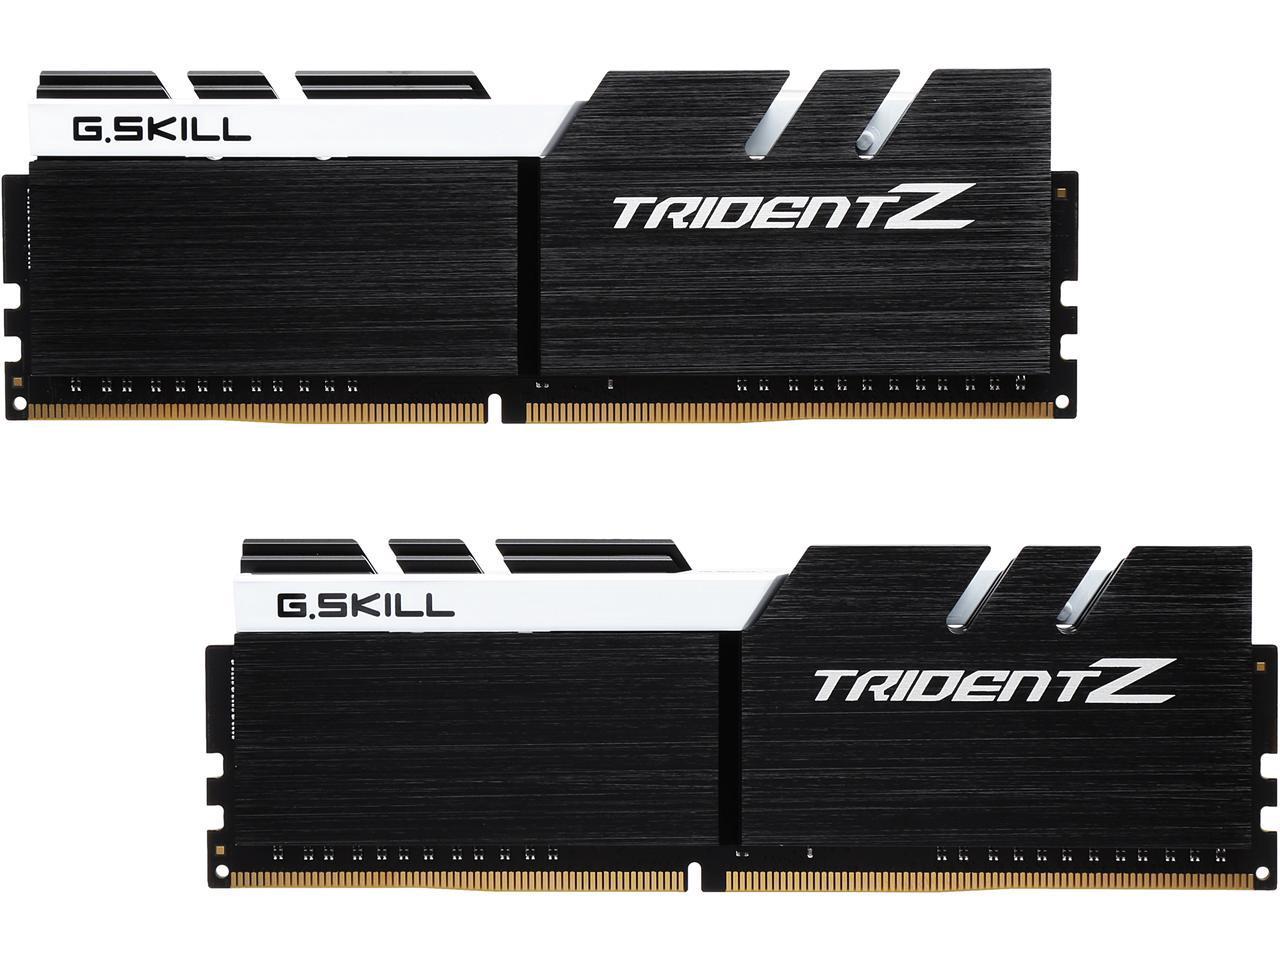 G.SKILL TridentZ 16GB (2x8GB) DDR4 3200 F4-3200C14D-16GTZKW